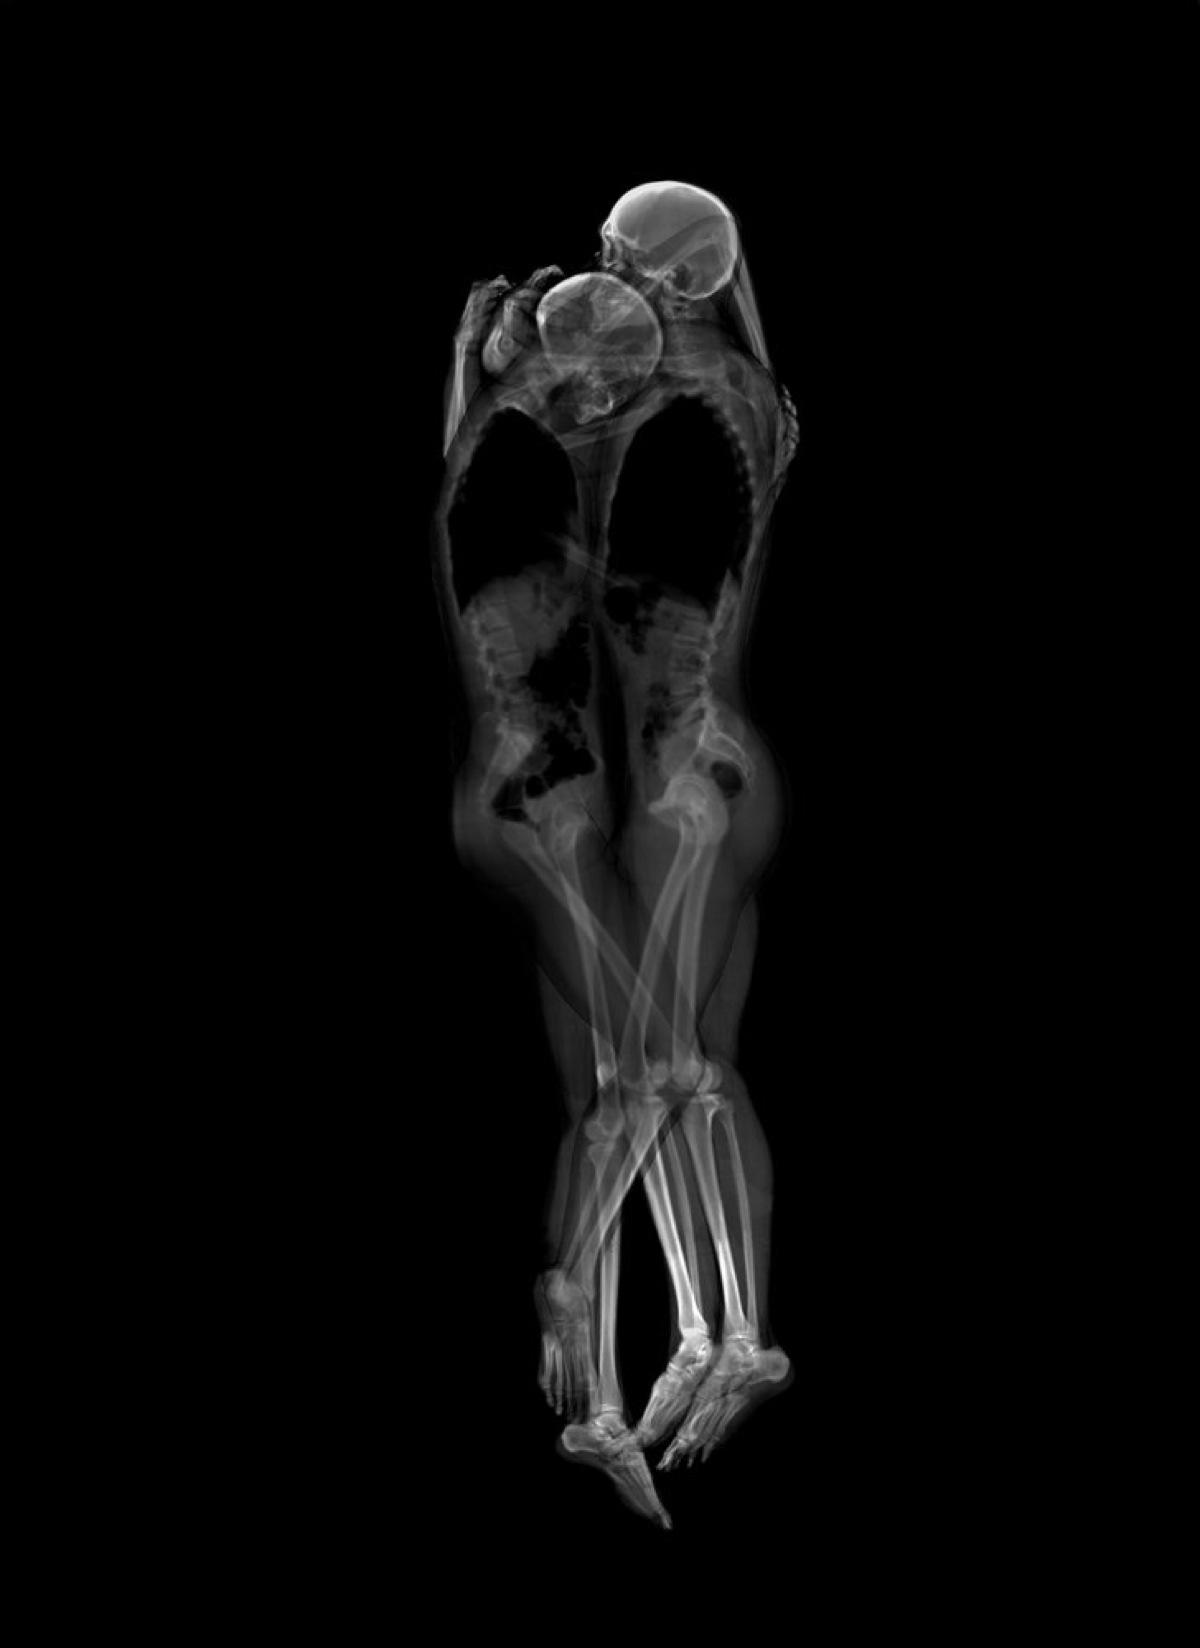 Секс с скелетами 10 фотография